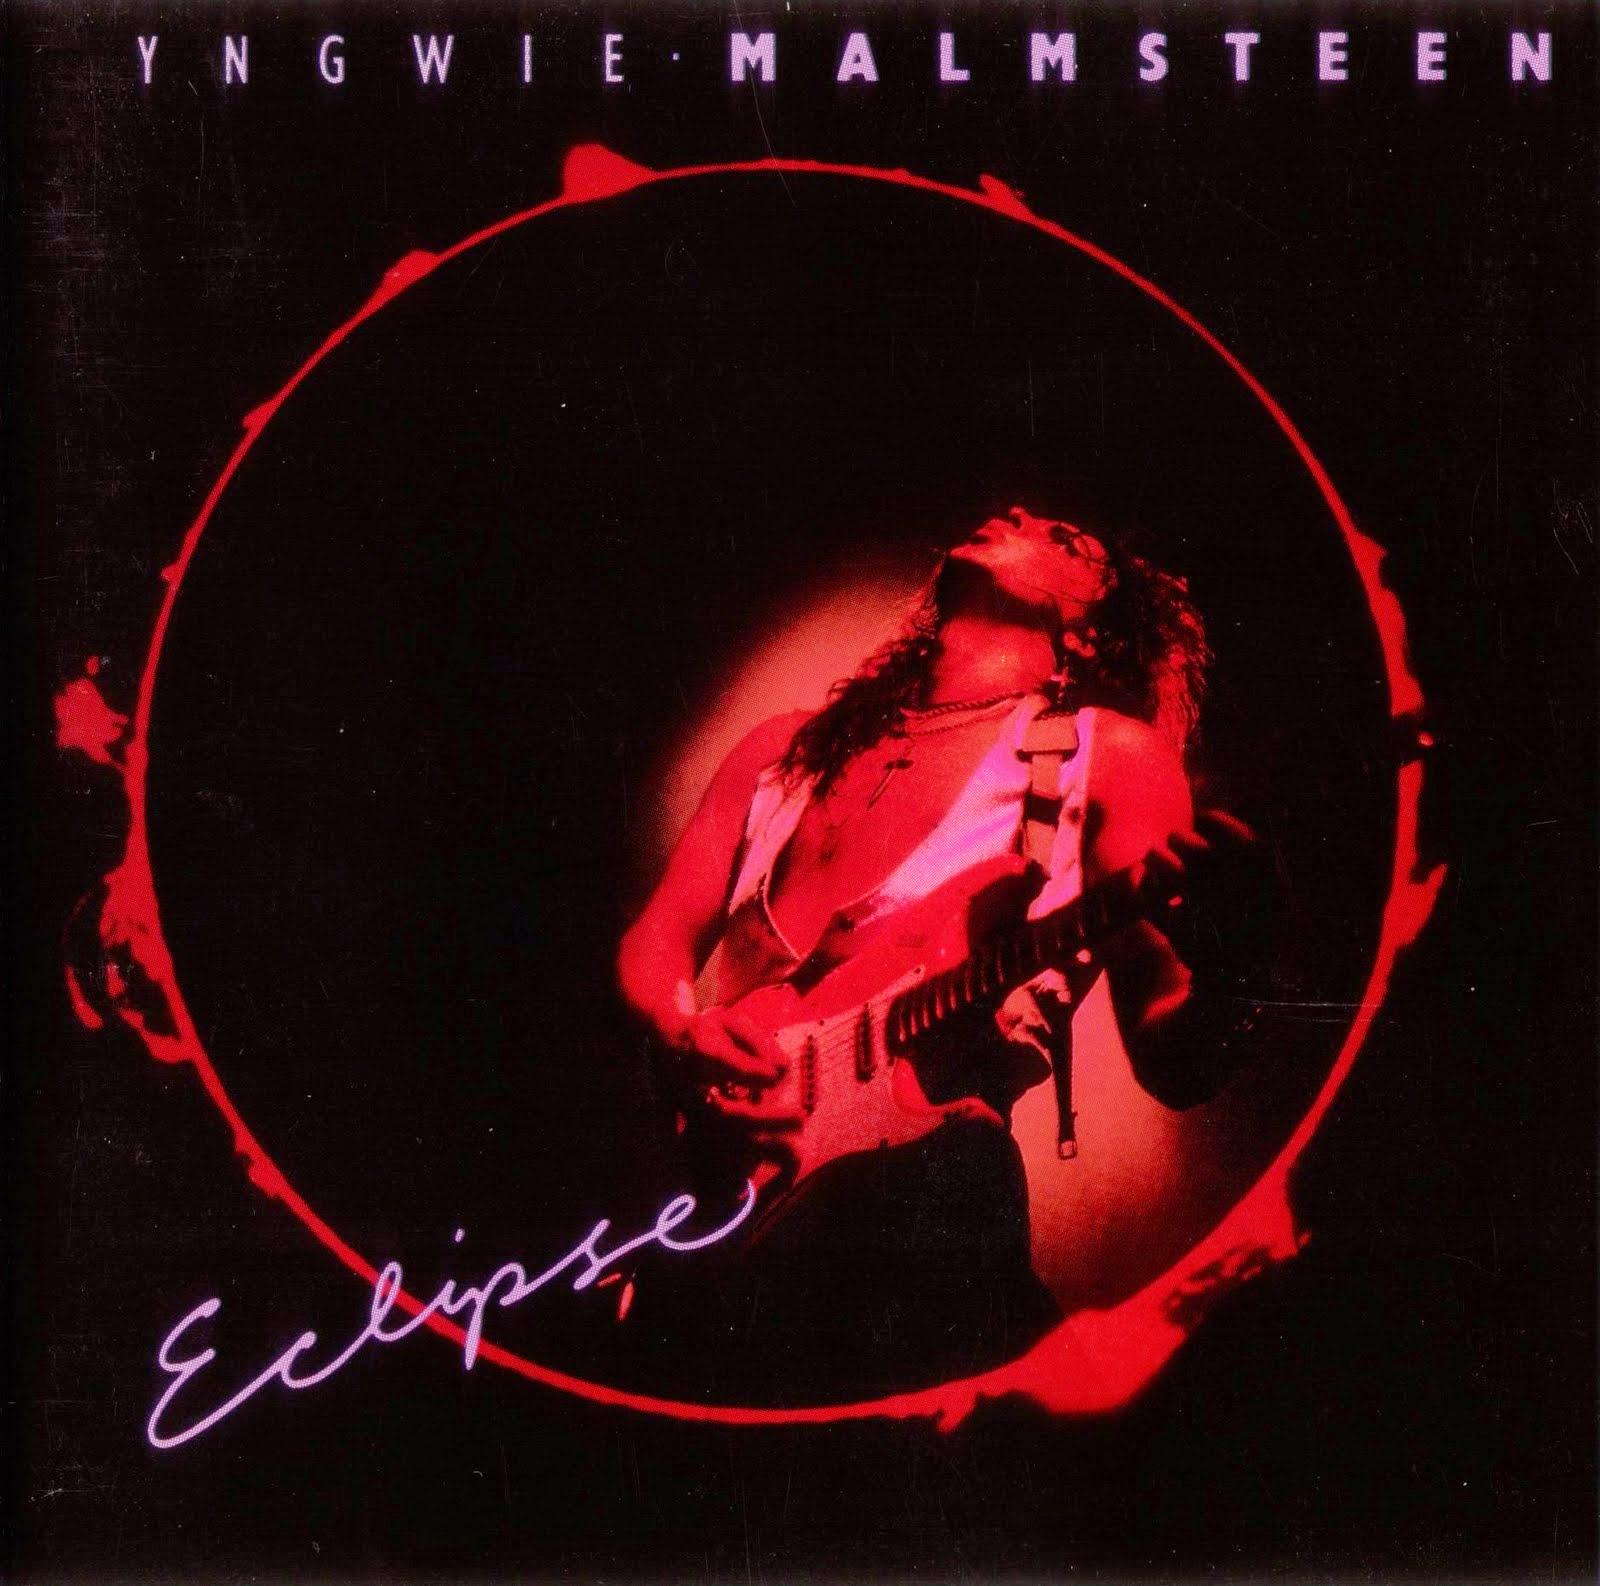 Portada Yngwie Malmsteen-Eclipse.jpg